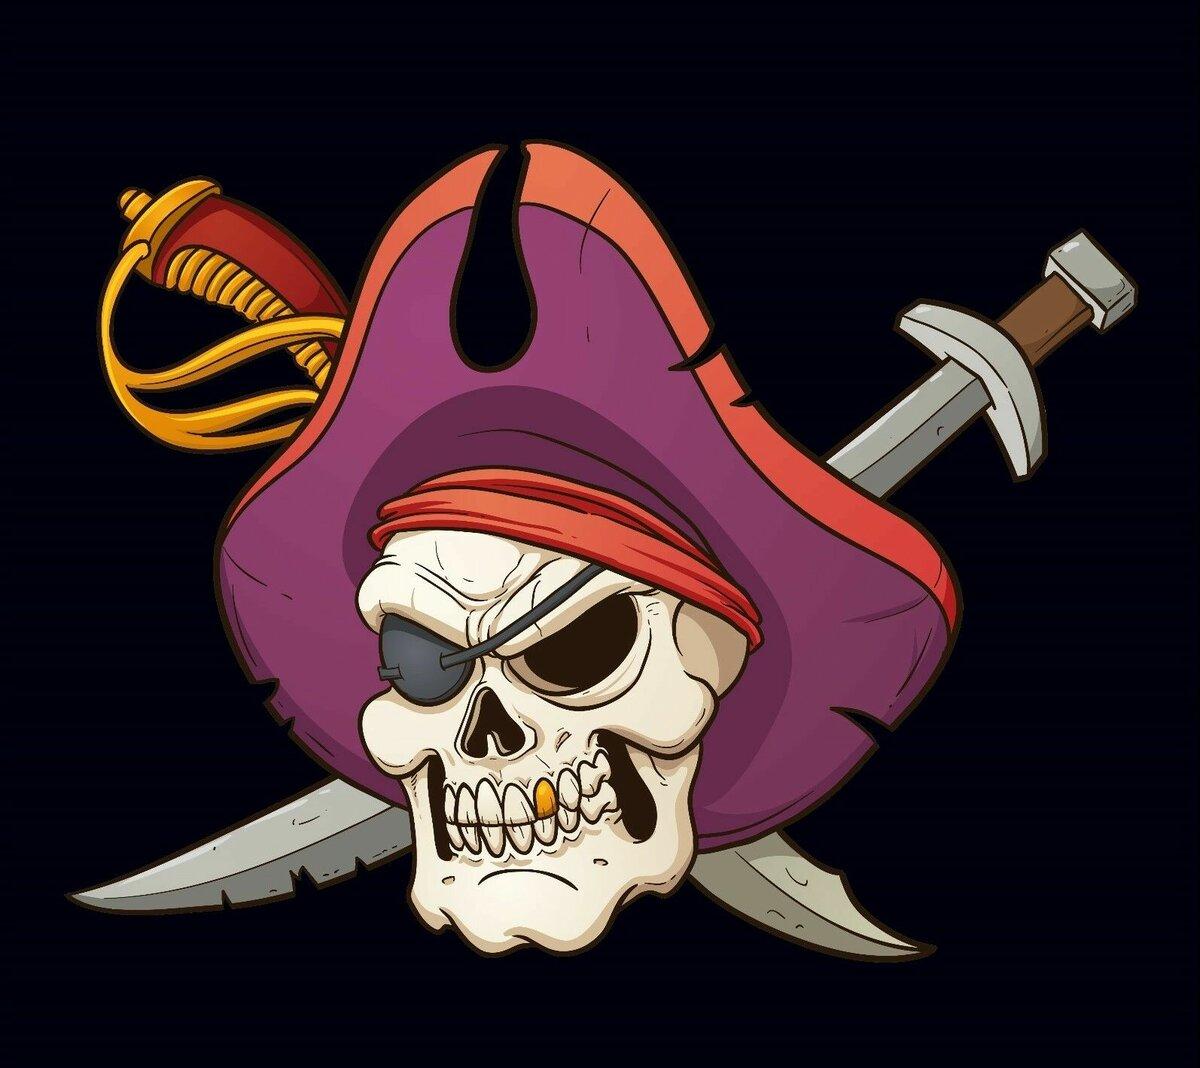 пират с флагом картинка хочу поздравить тебя